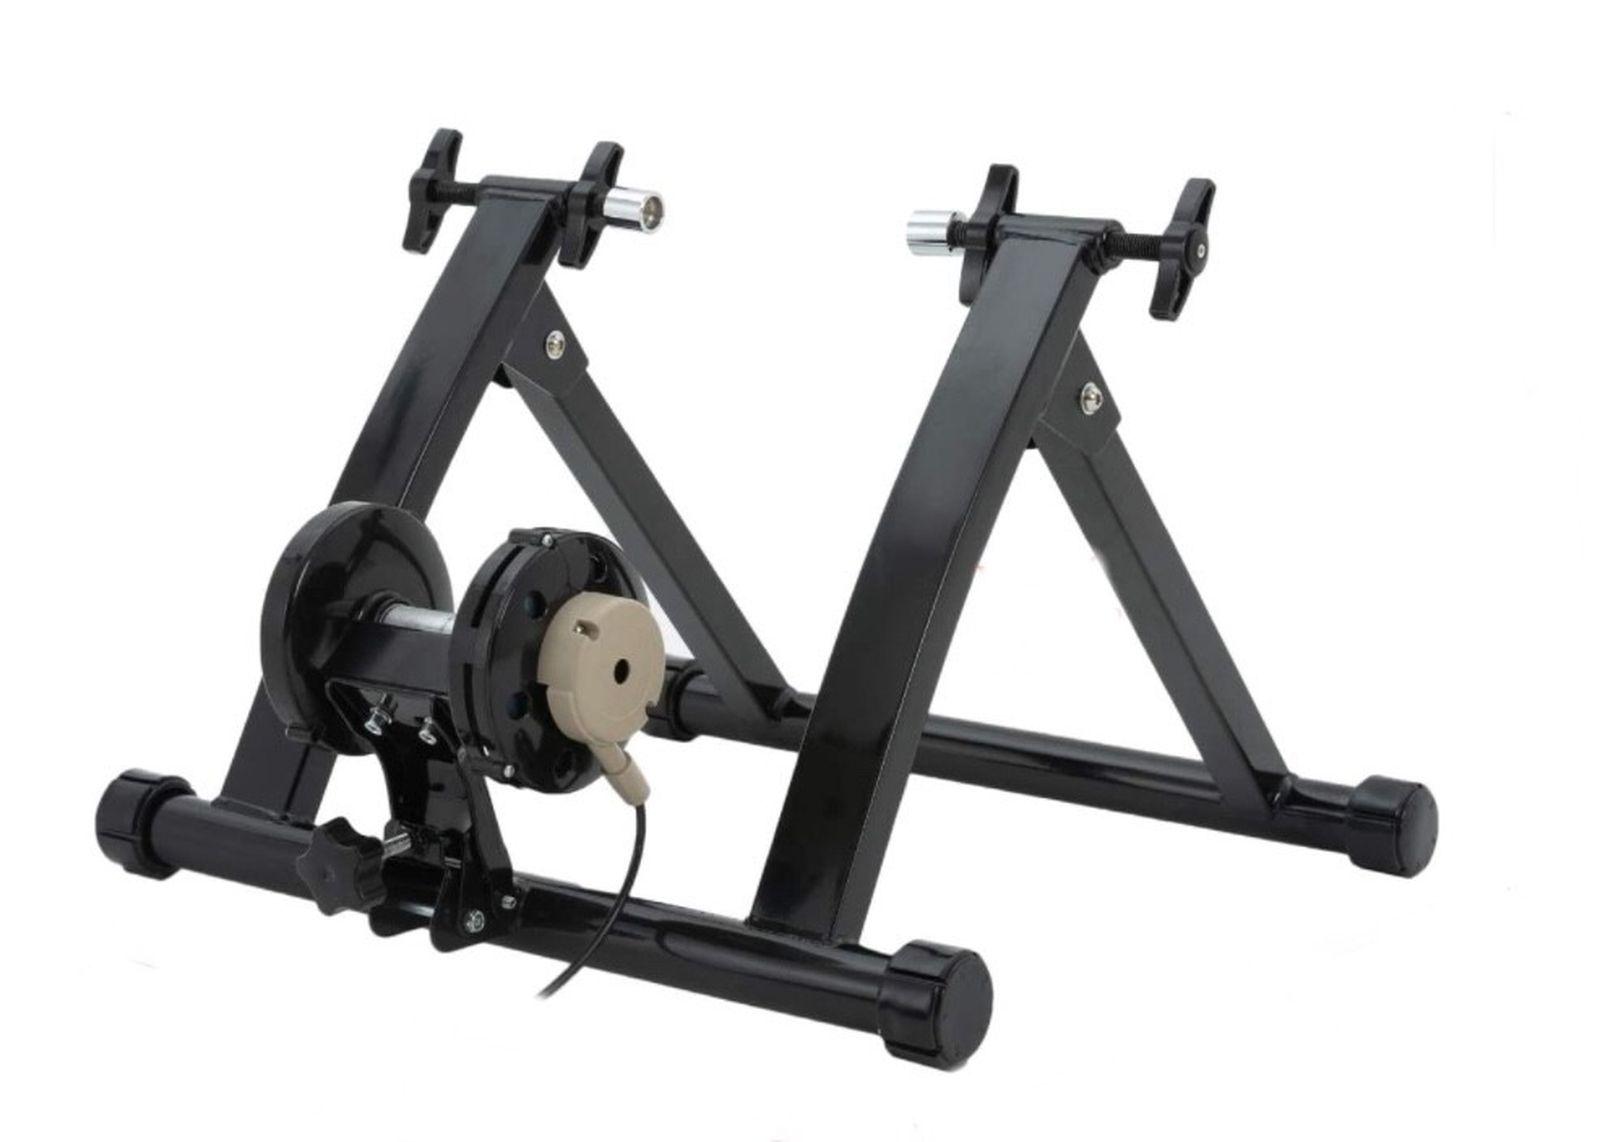 walmann indoor bike trainer